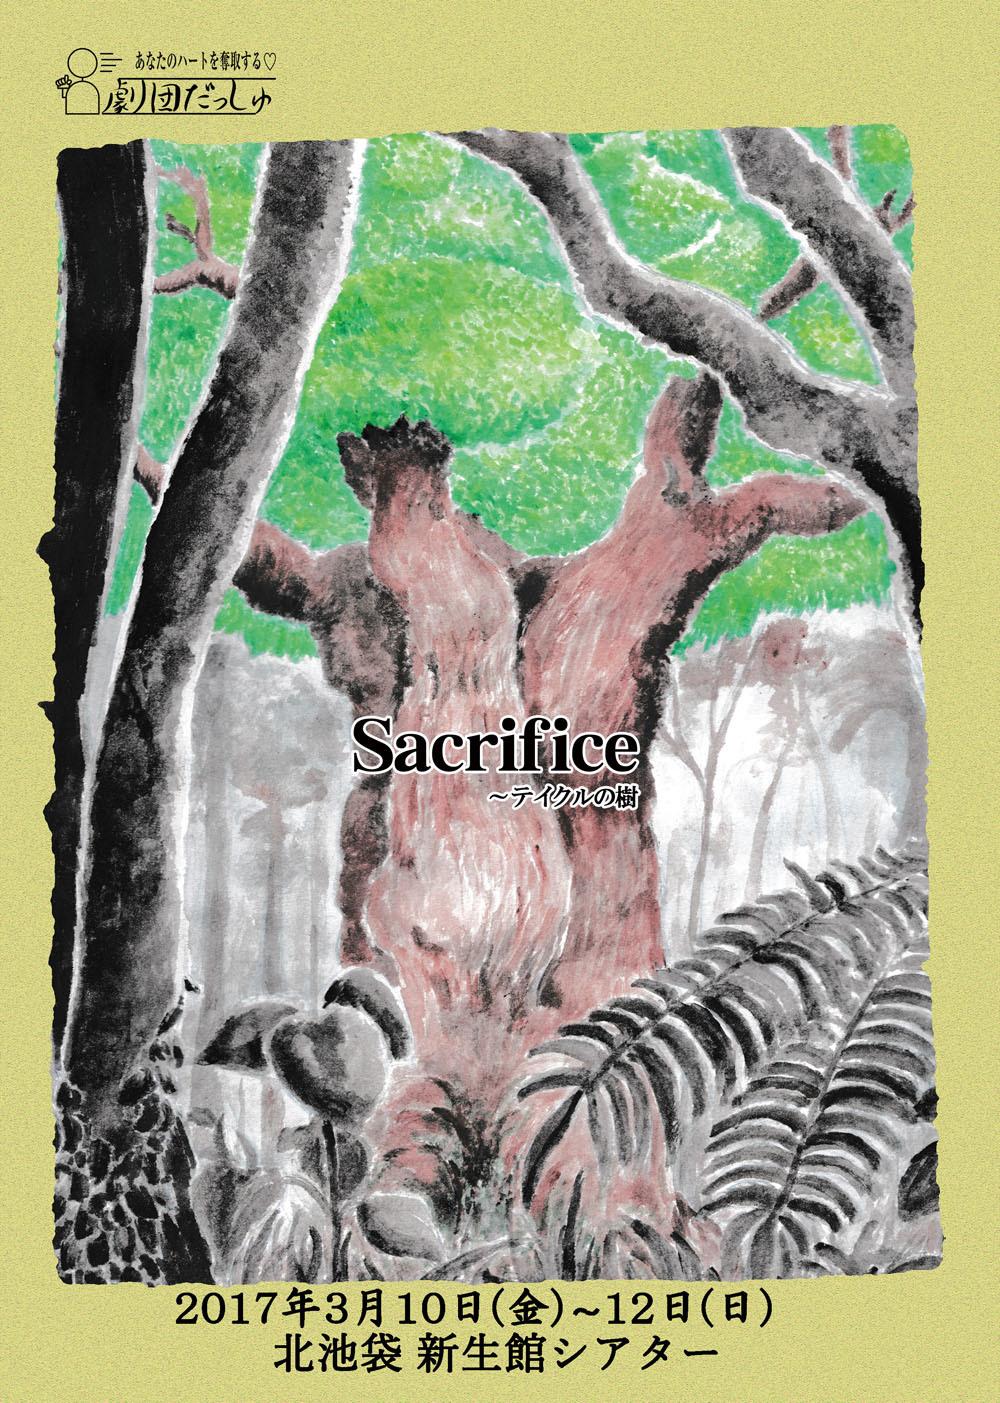 Sacrifice_1000.jpg